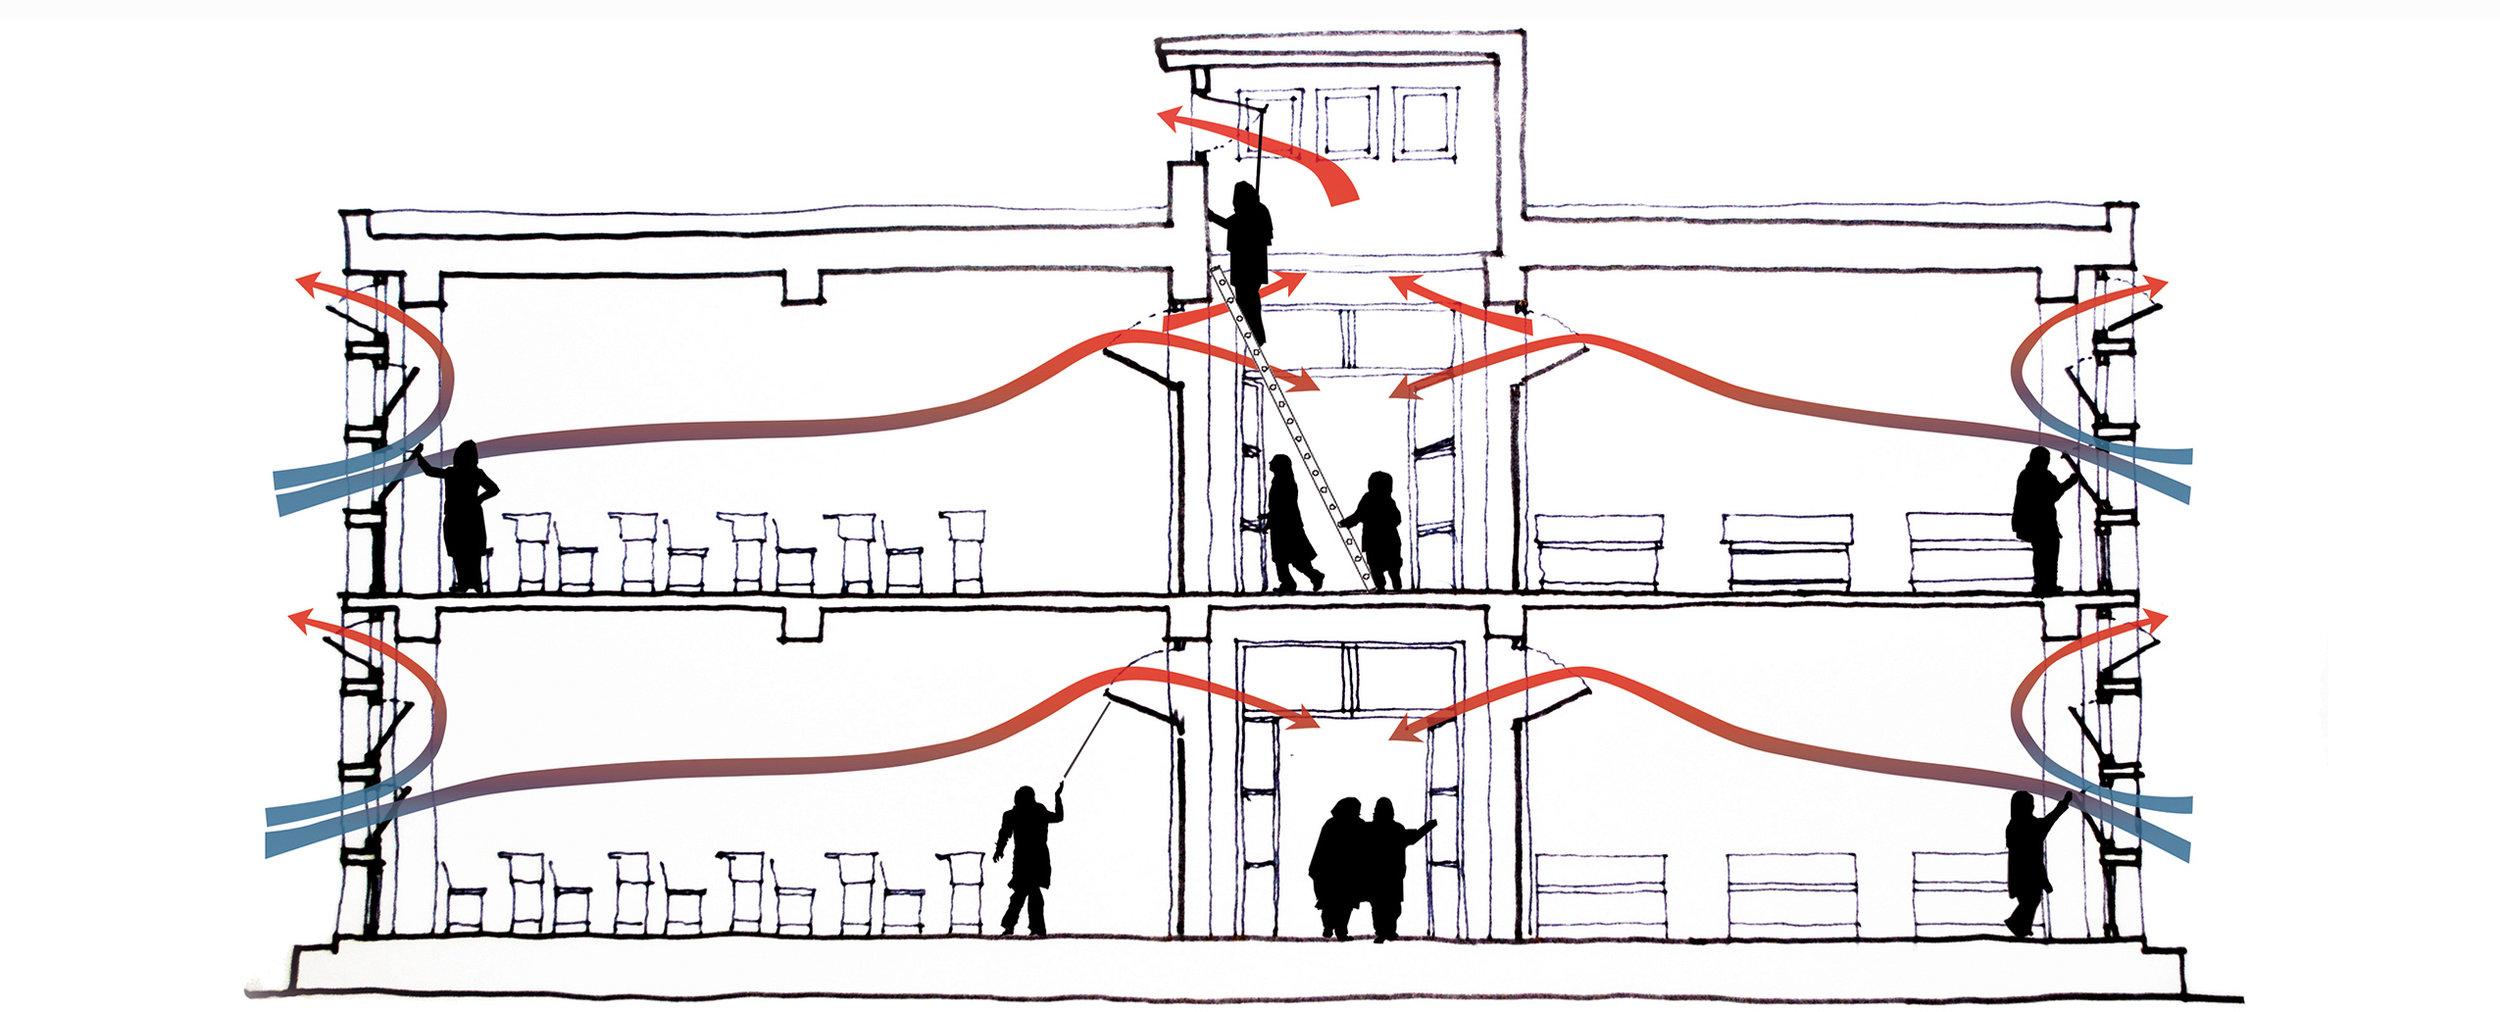 ventilation concept.jpg